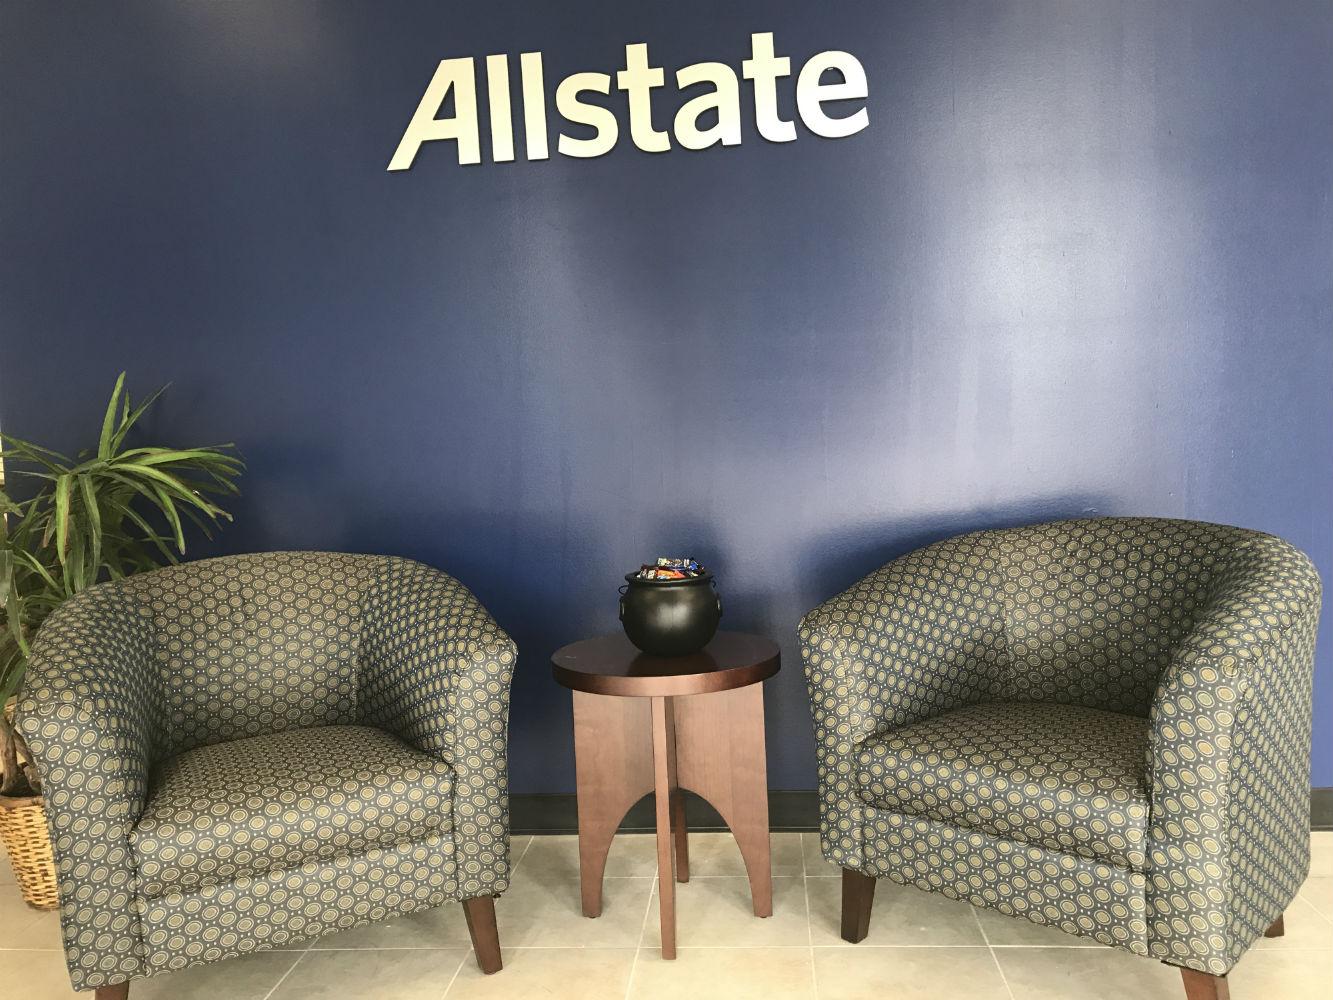 Luis Martinez: Allstate Insurance image 6